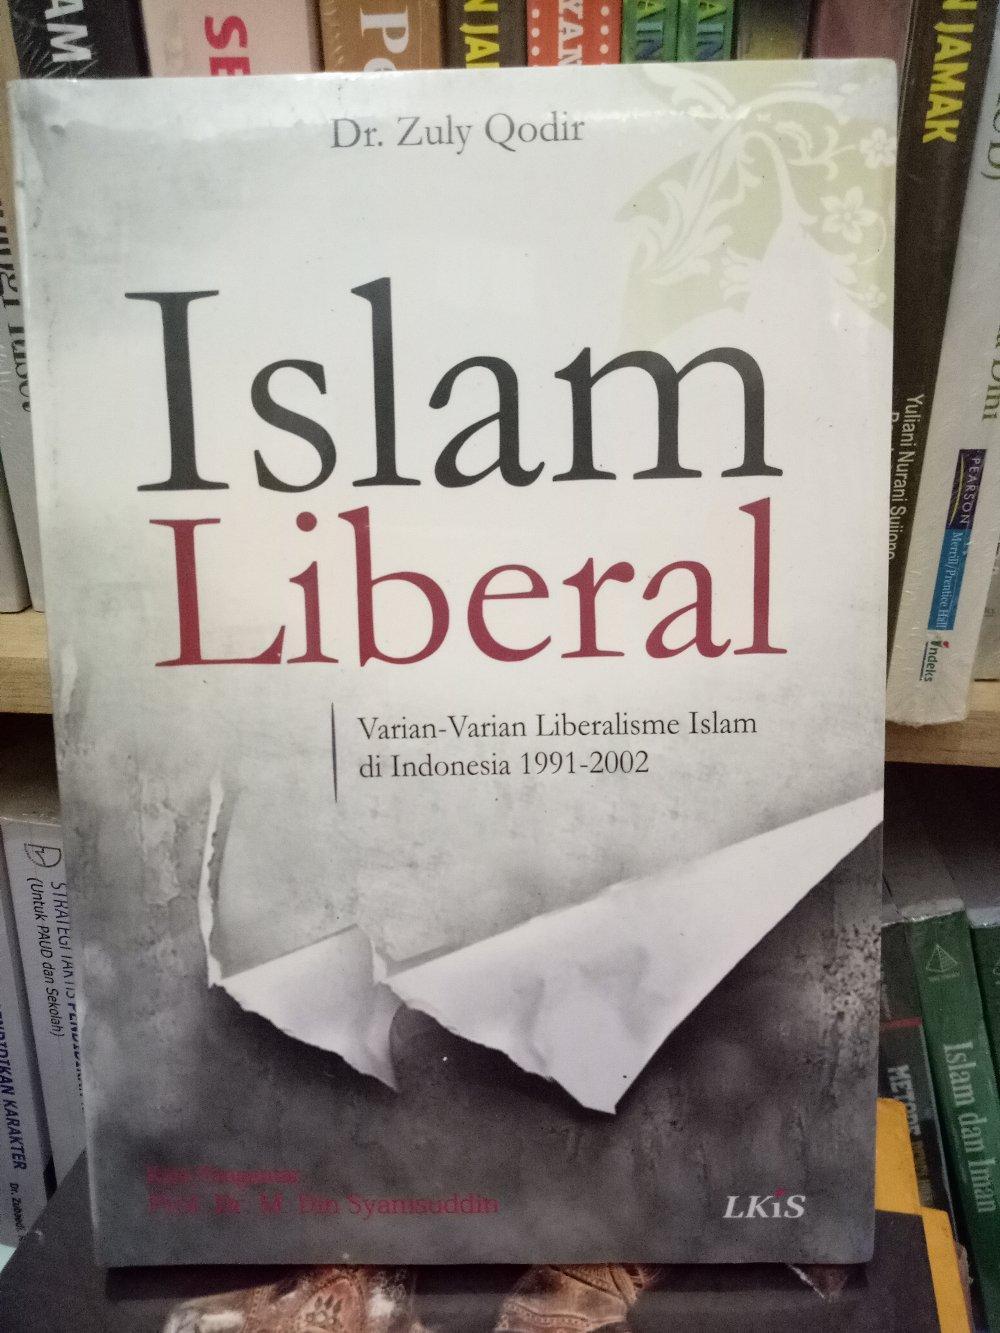 Islam Liberal - Zuly Qodir By Metro Bookstore Malang.